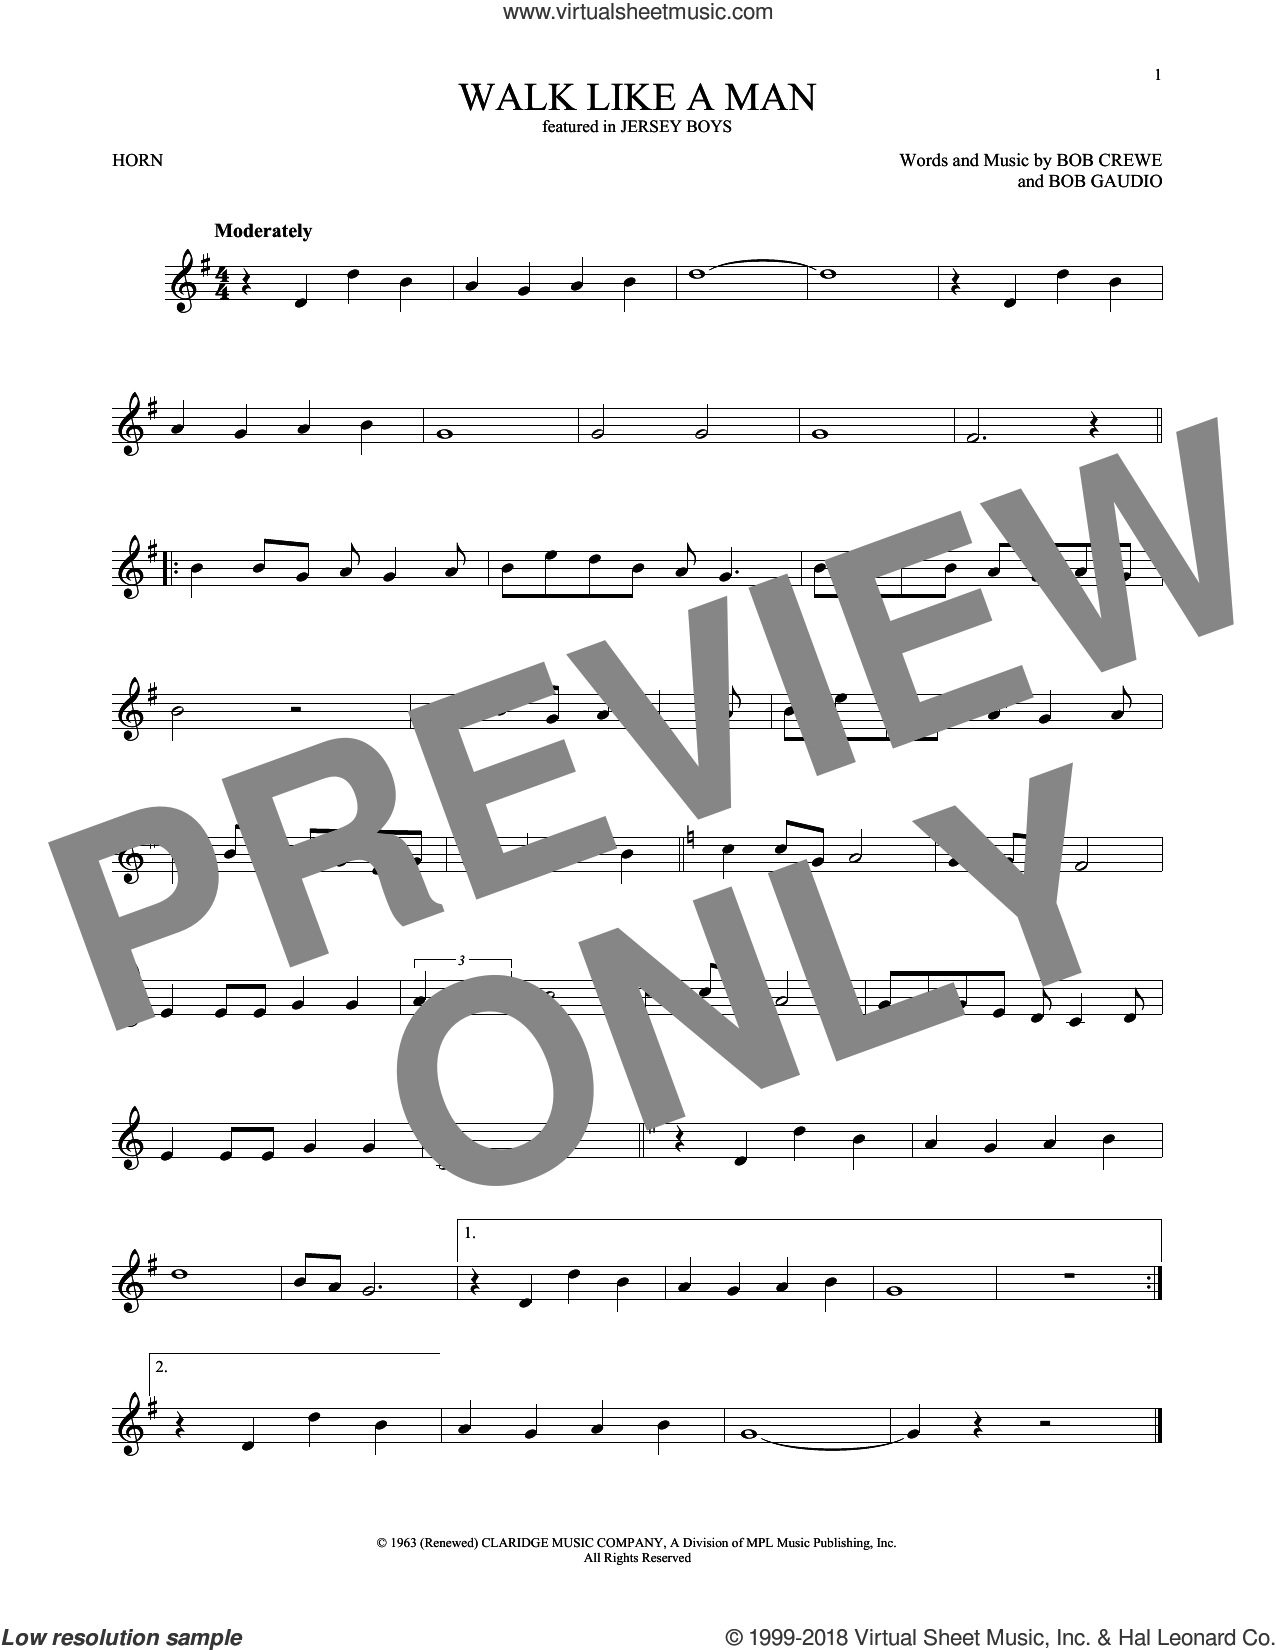 Walk Like A Man sheet music for horn solo by The Four Seasons, Bob Crewe and Bob Gaudio, intermediate skill level